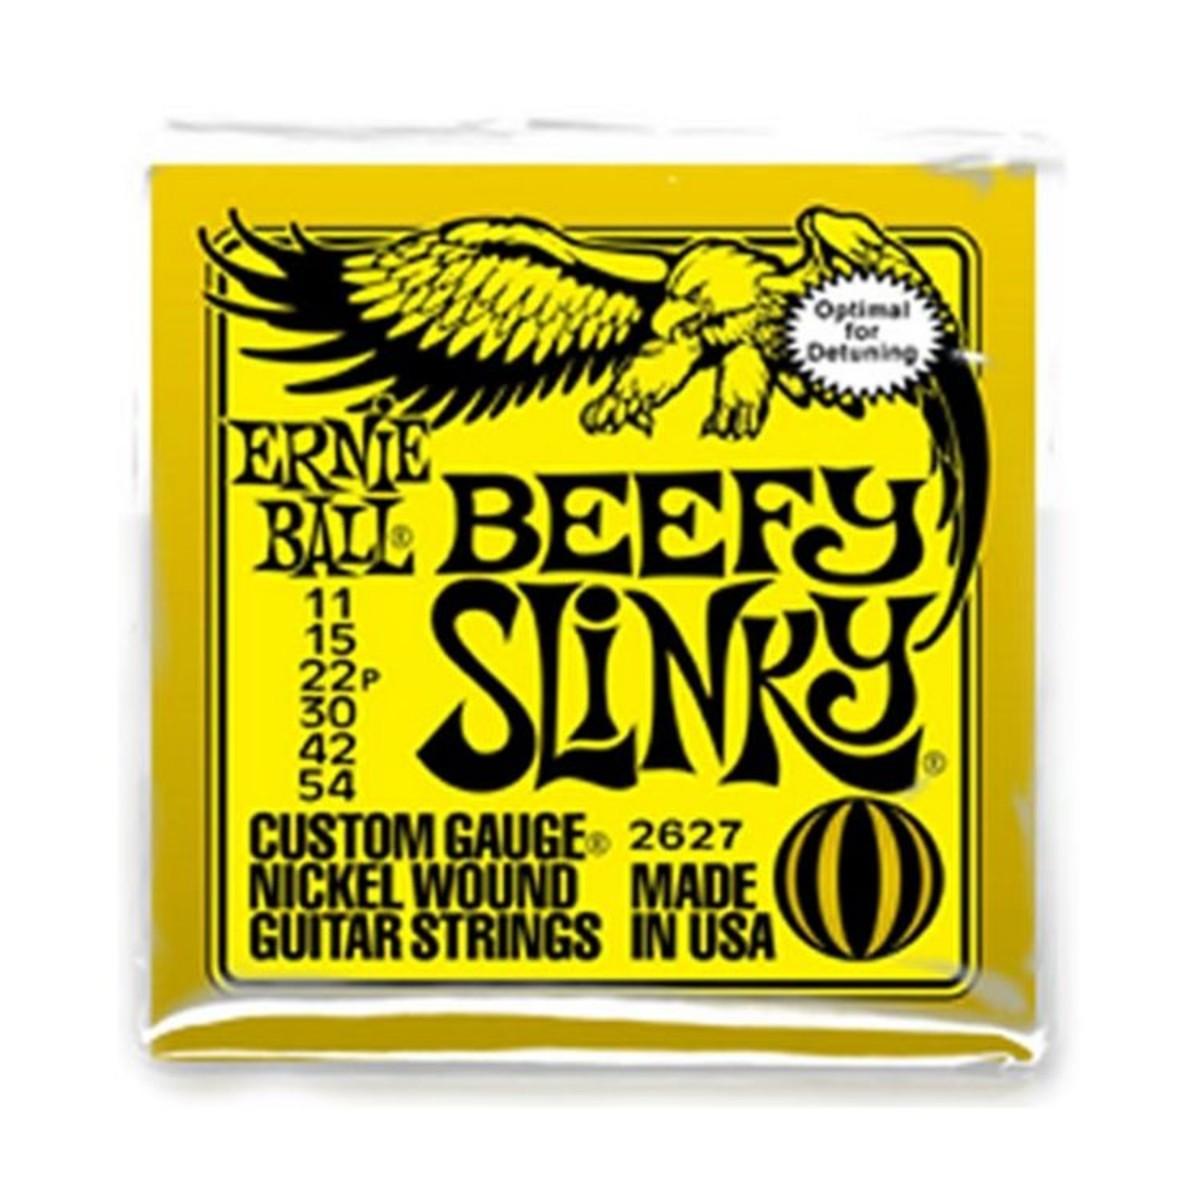 Ernie Ball Beefy Slinky Strings 11-54